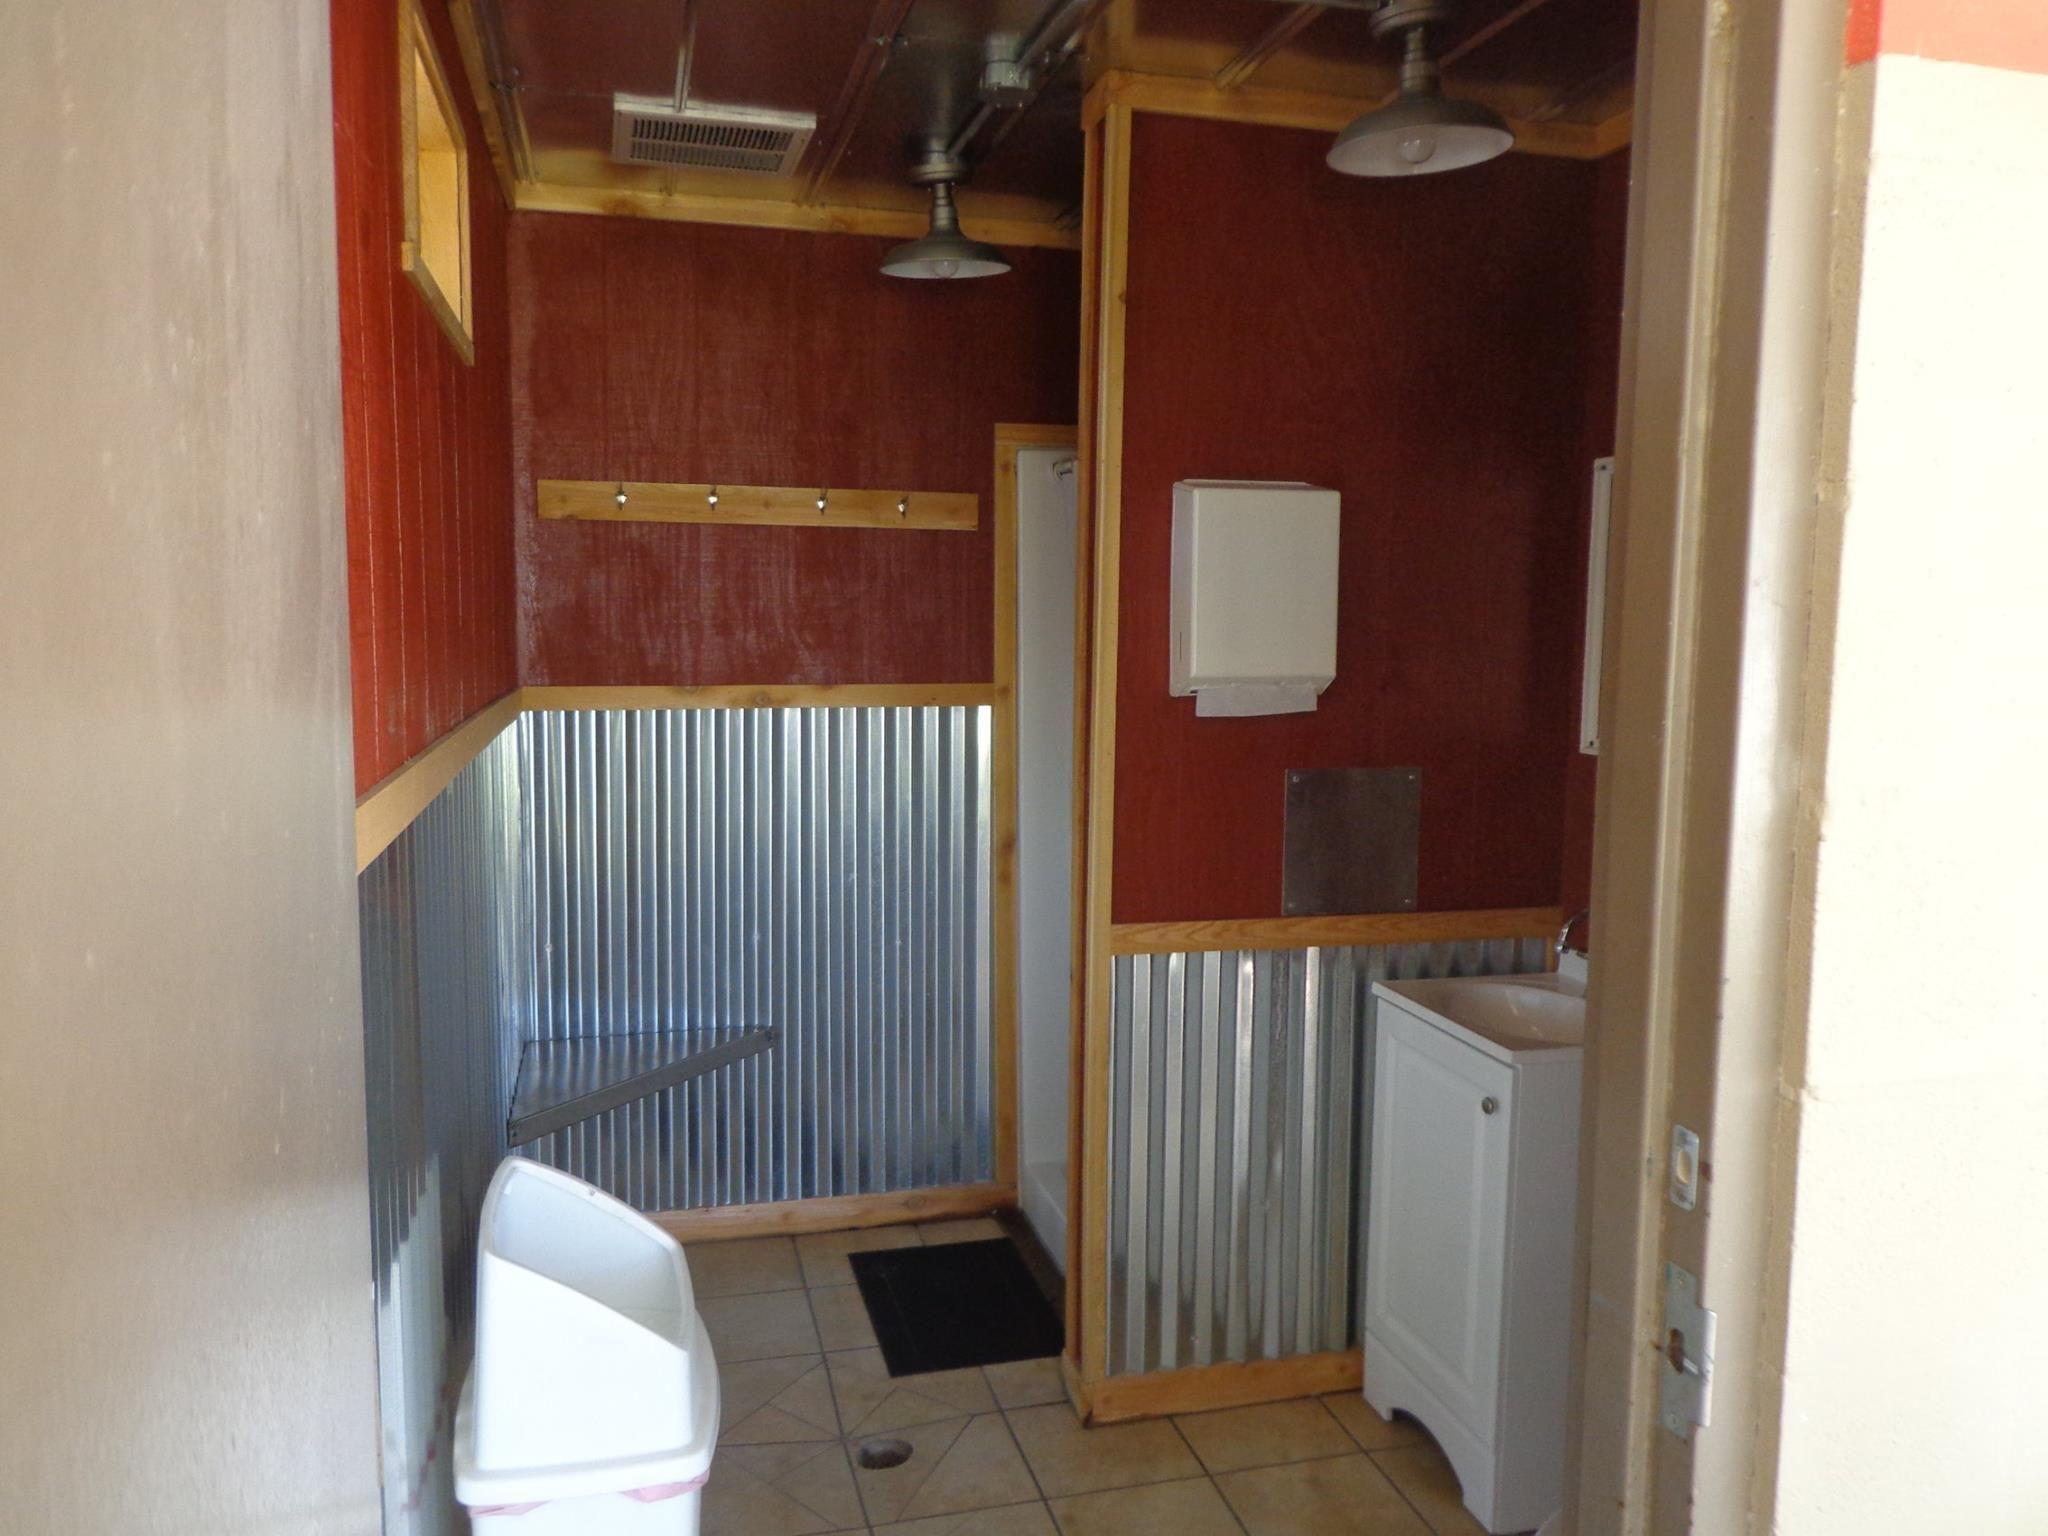 New family style restrooms at the Fredericksburg, TX KOA ...